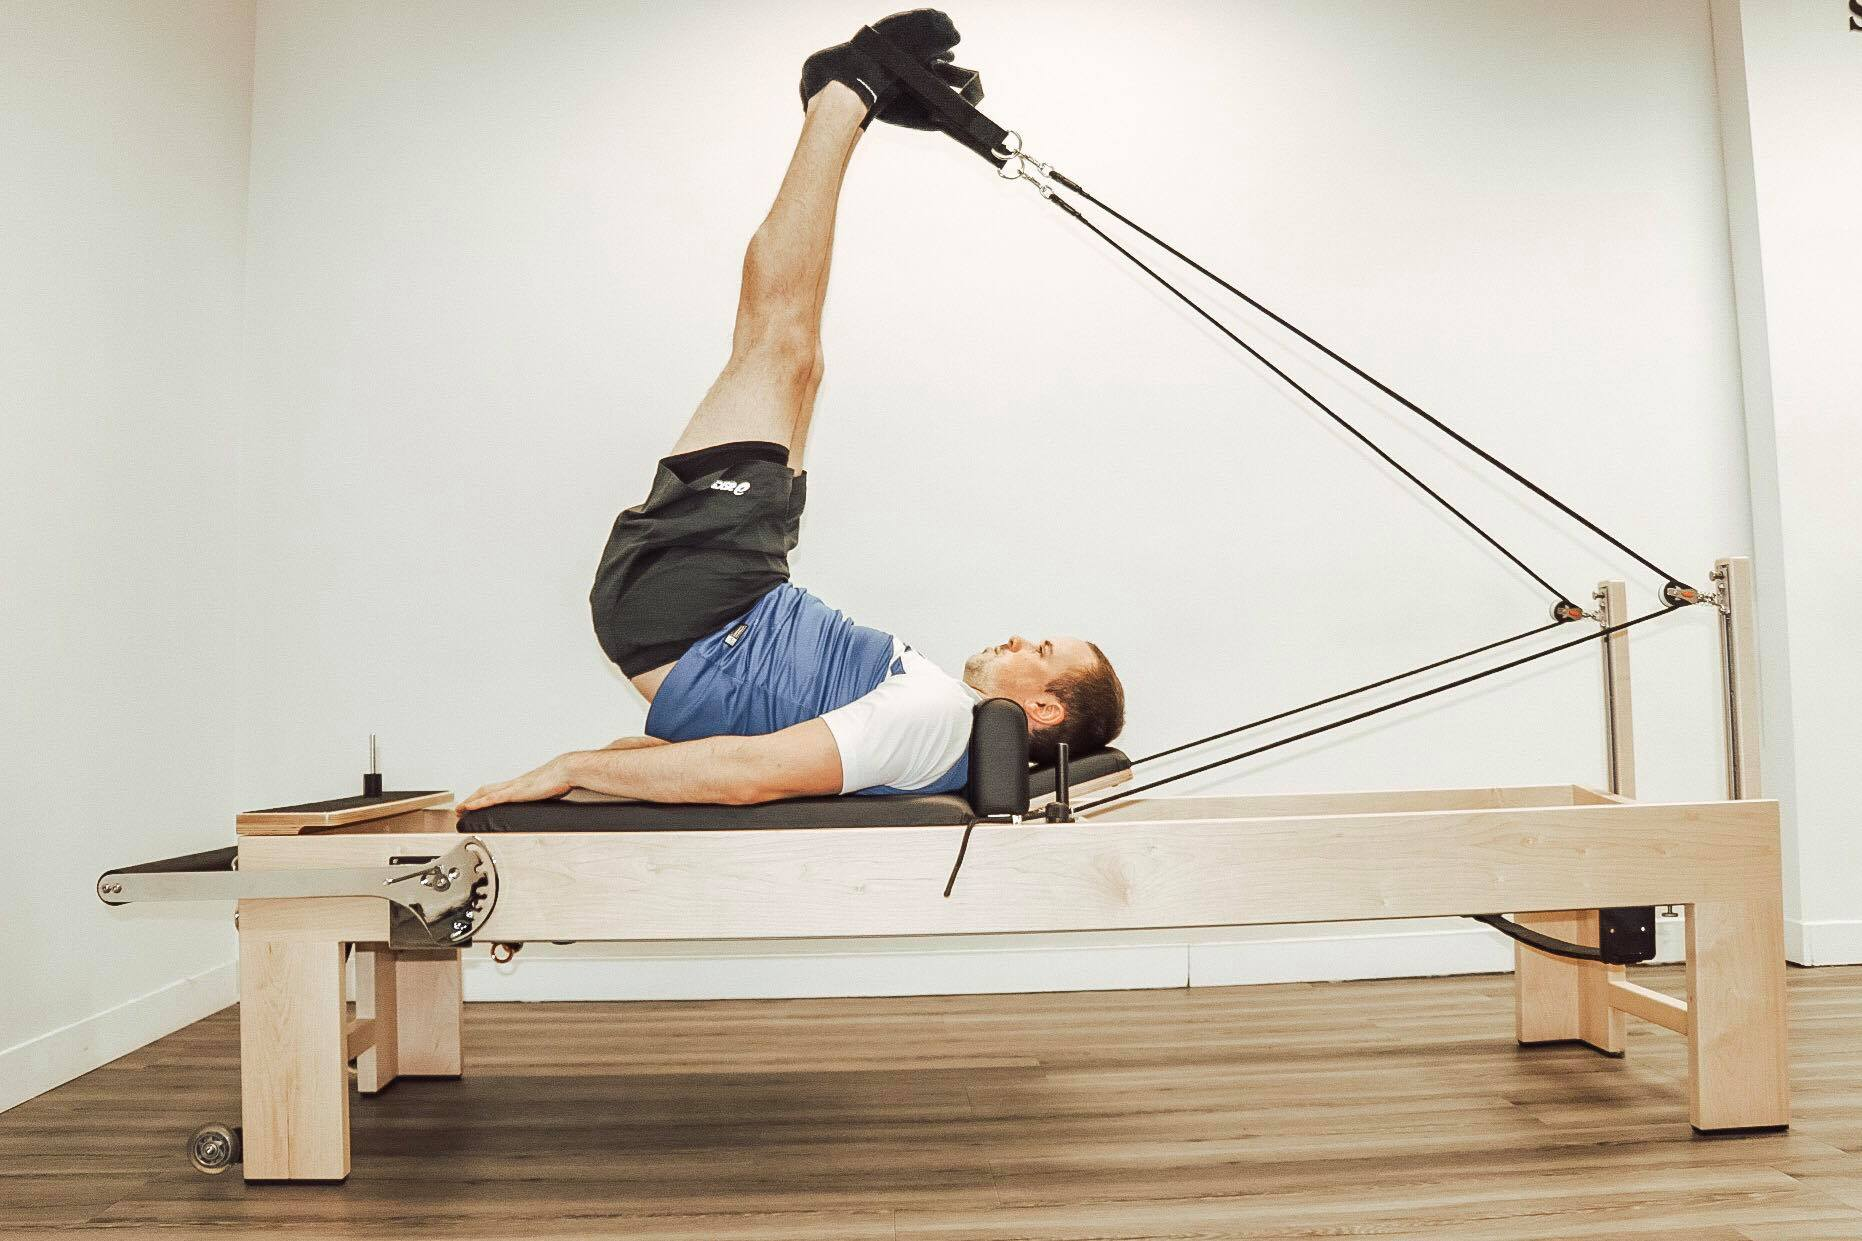 Reformer Pilates workout